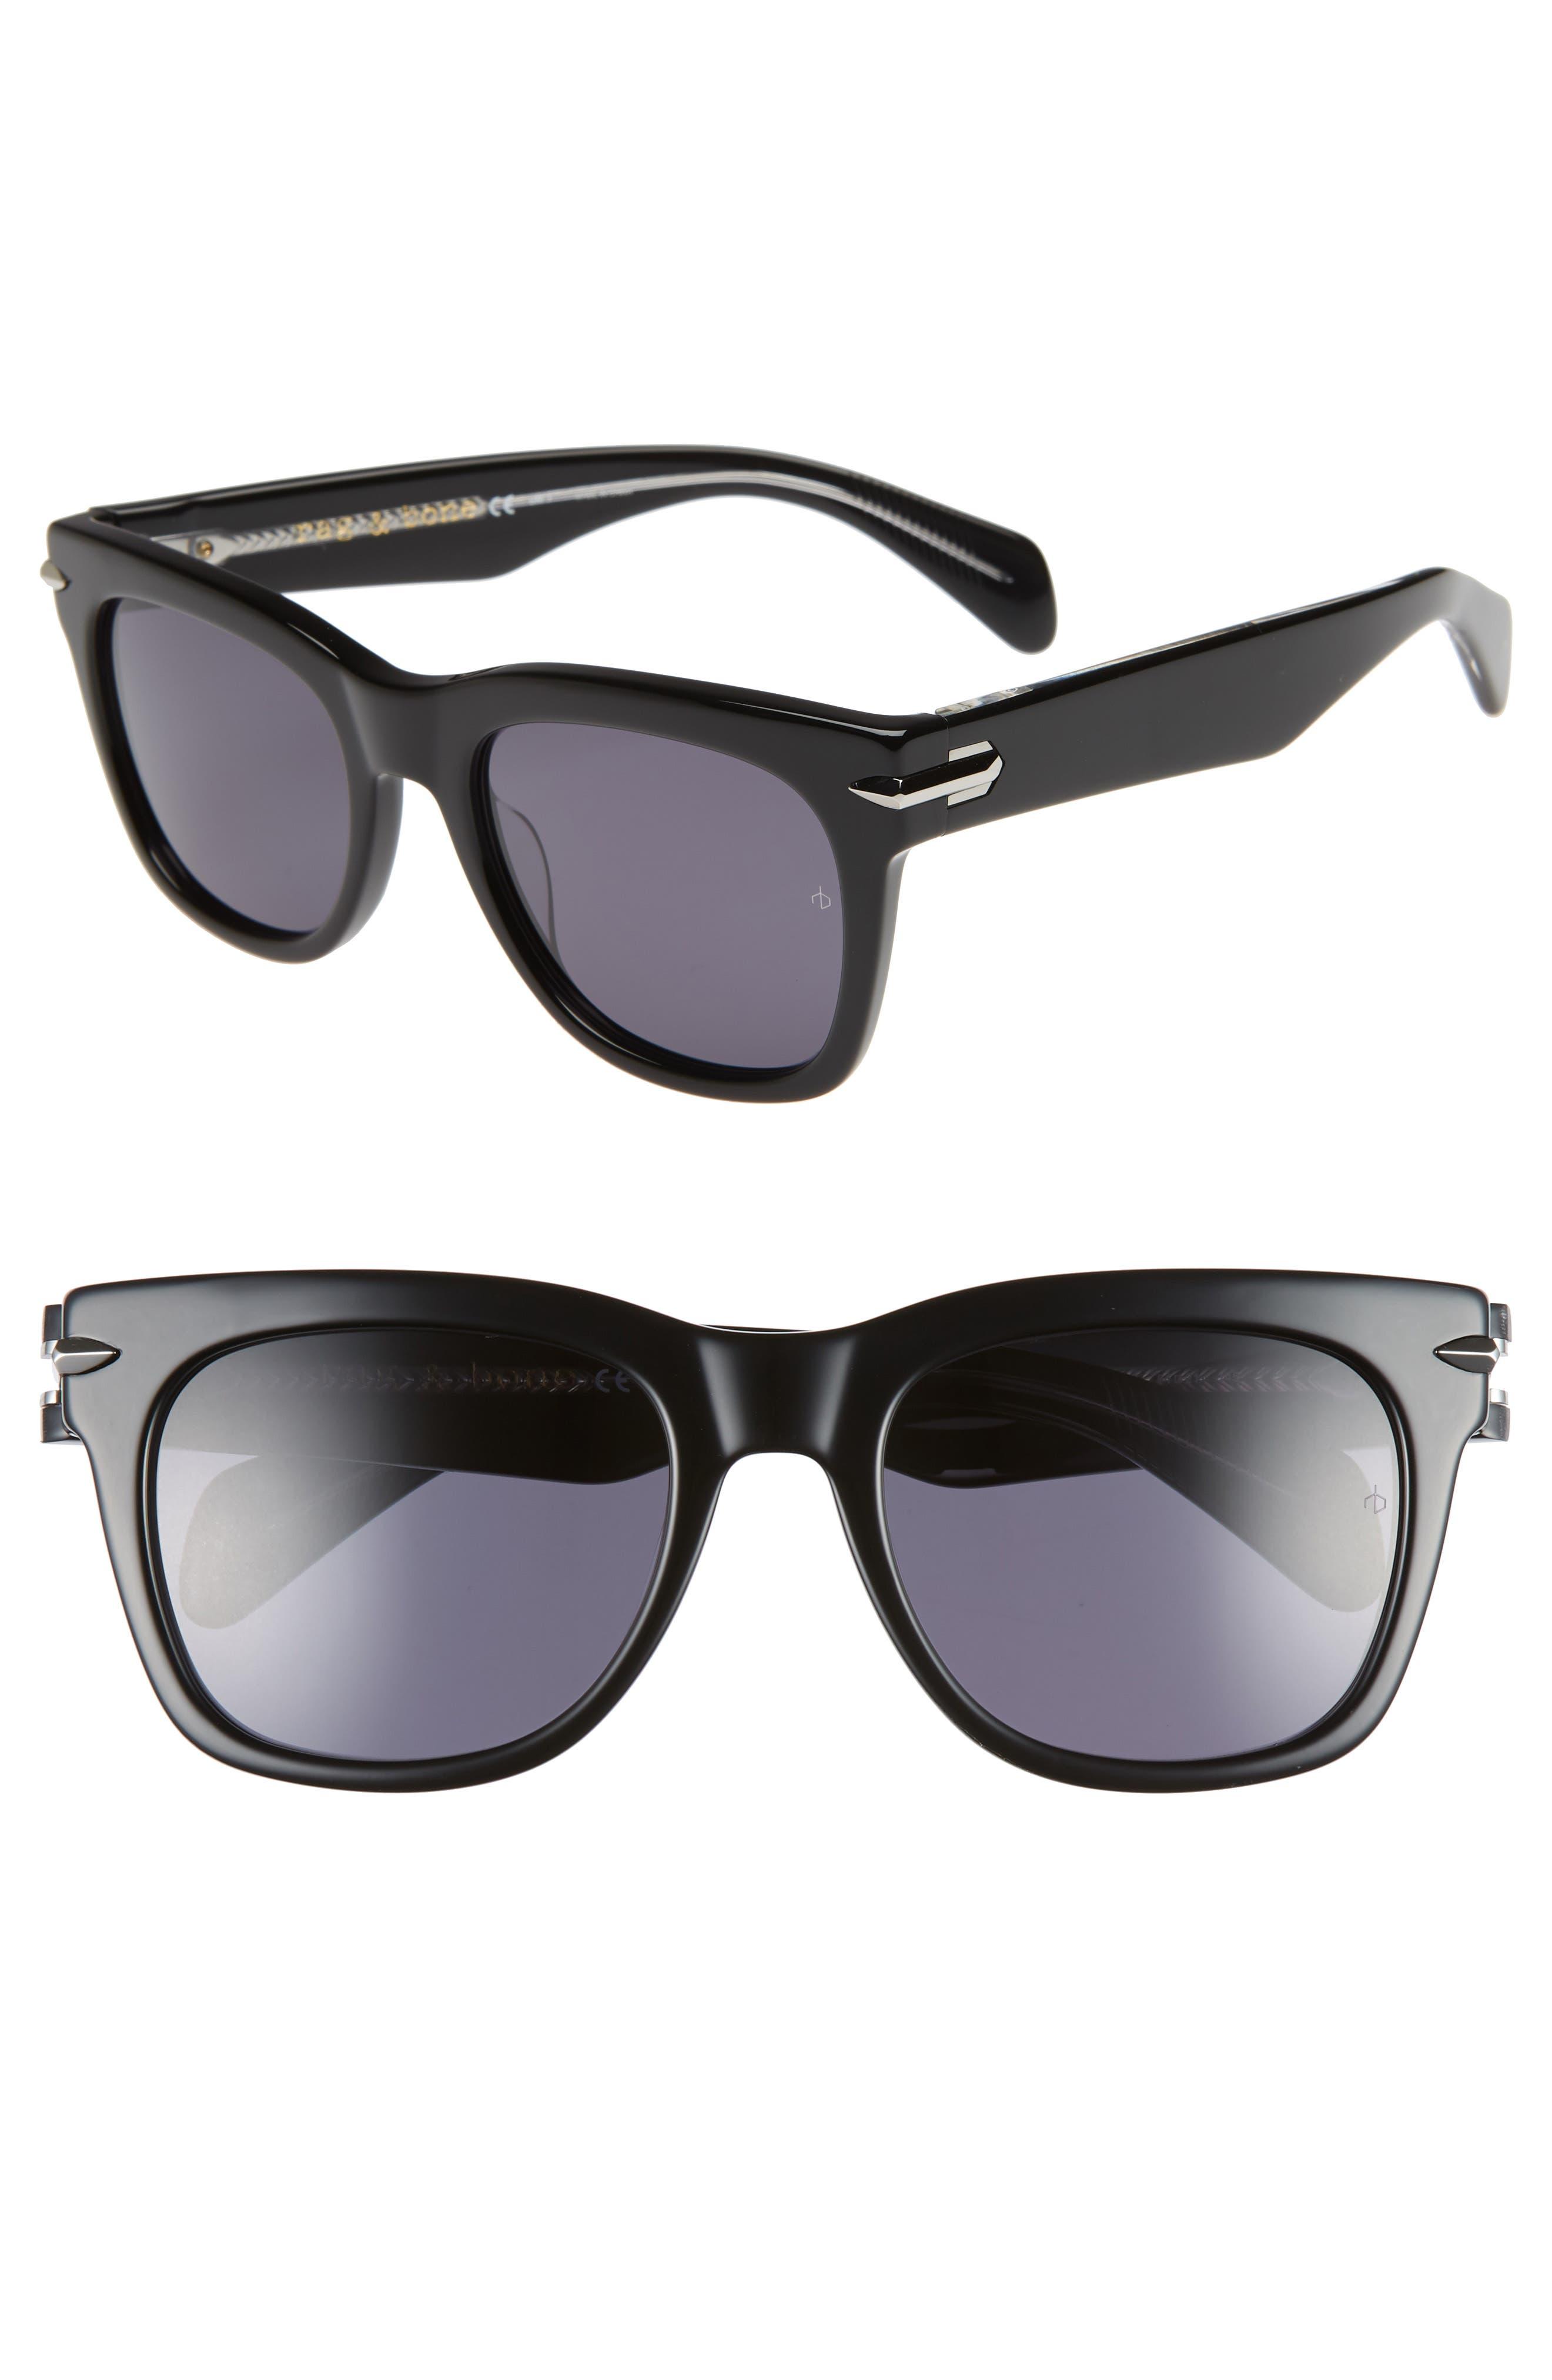 93c5a3c686c3 Rag & Bone 5m Polarized Sunglasses - Black